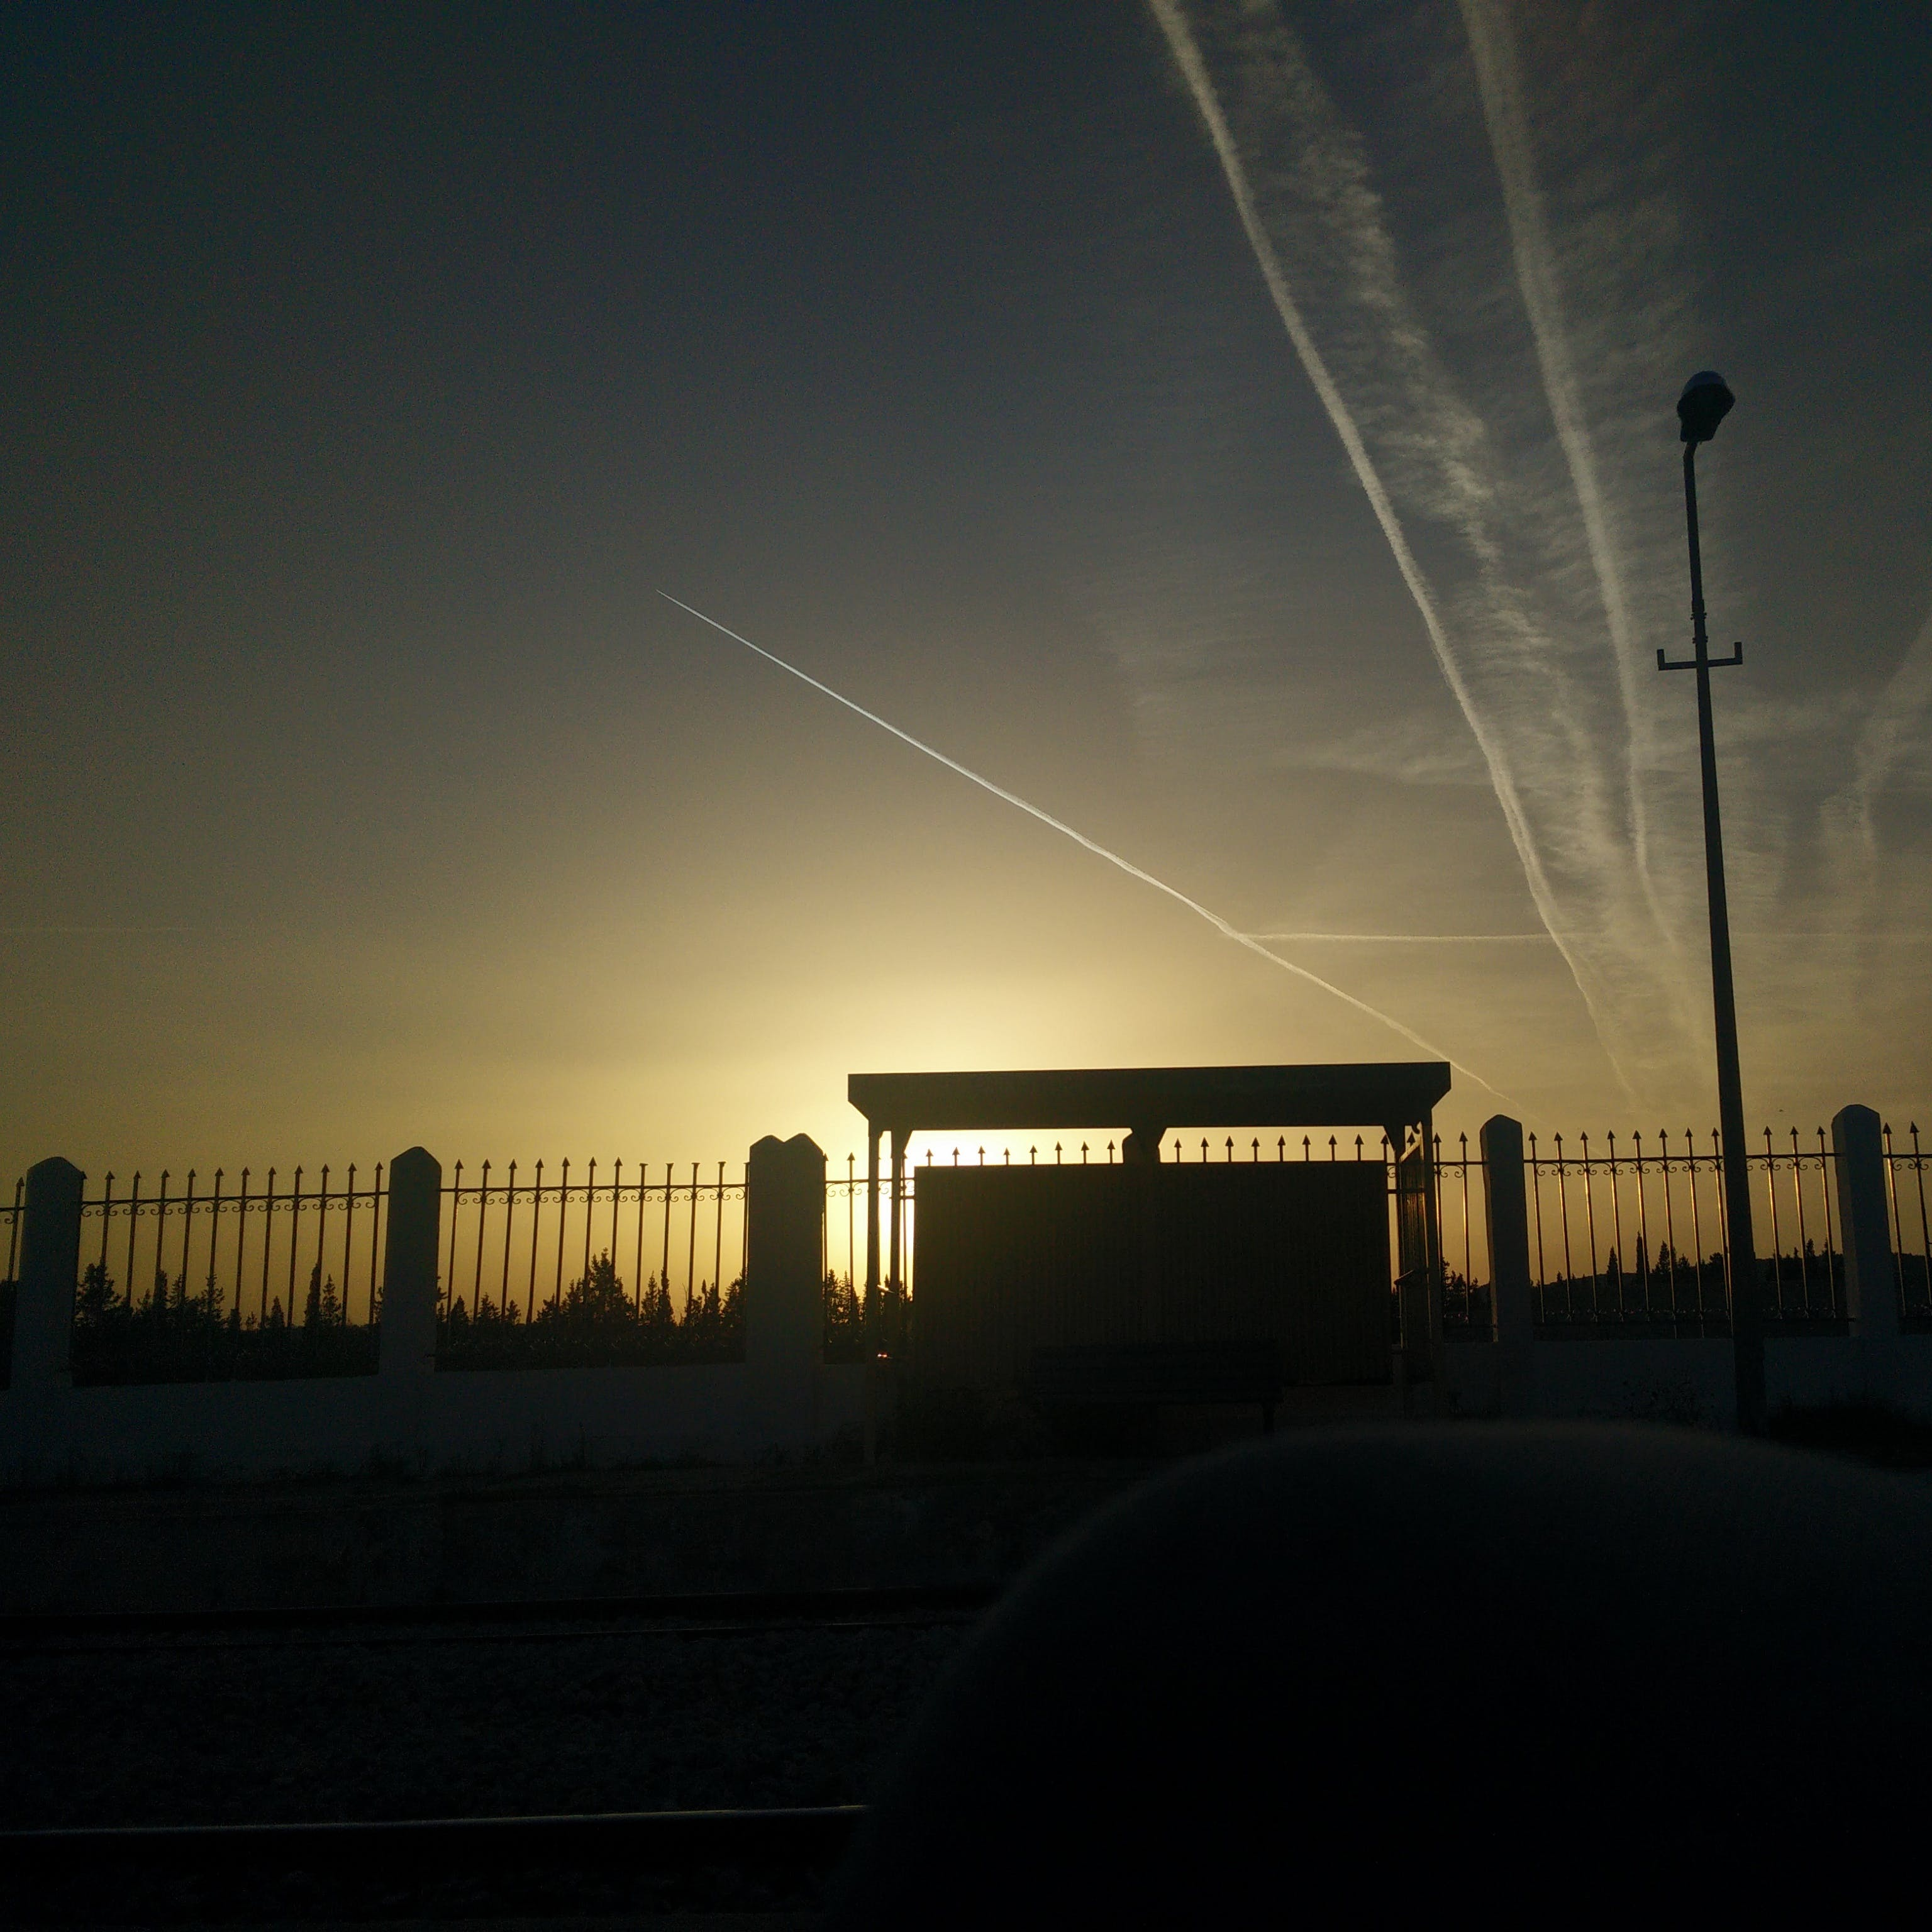 Free stock photo of #mobilechallenge, mobilechallenge, sun, sunset